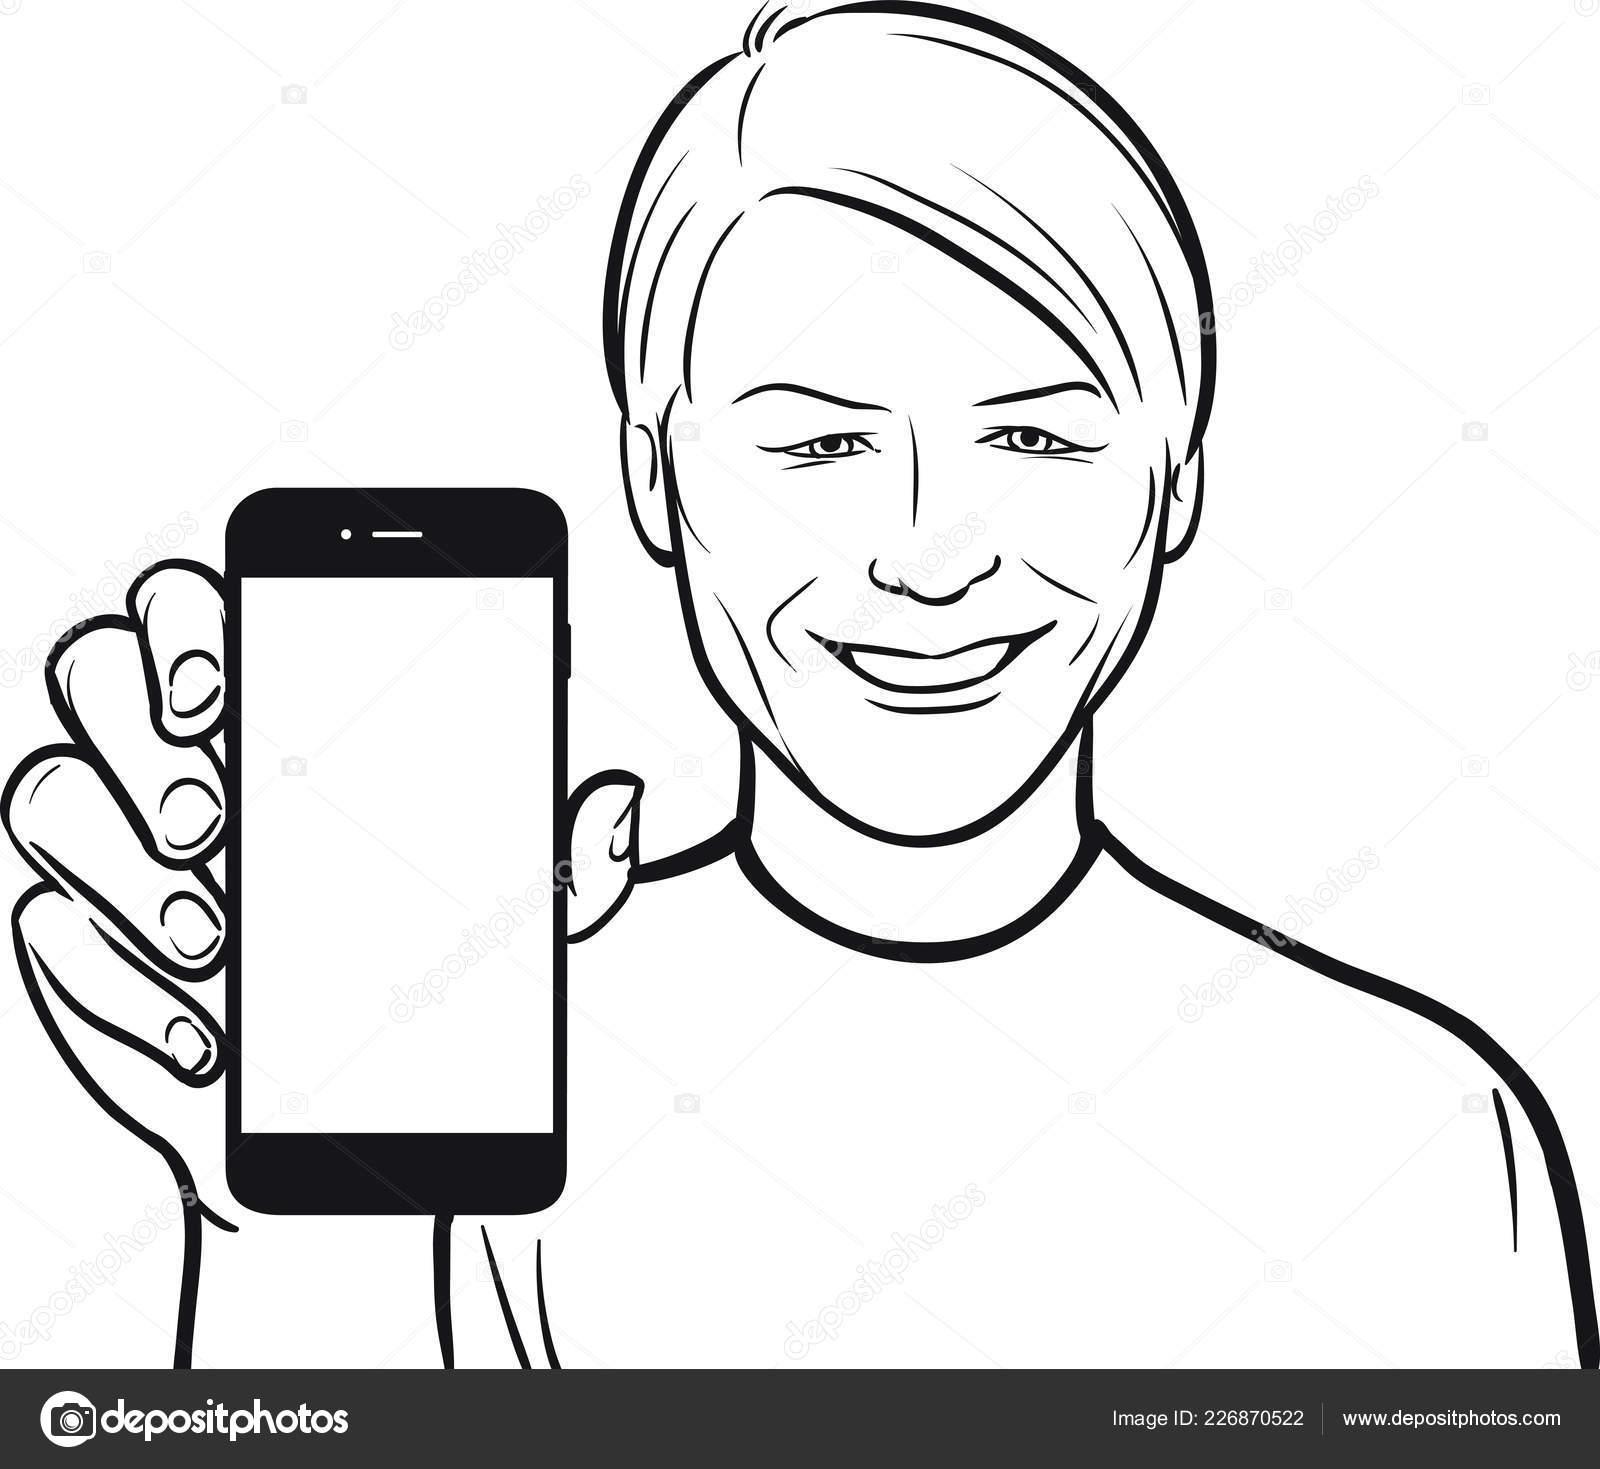 jappy mobil app